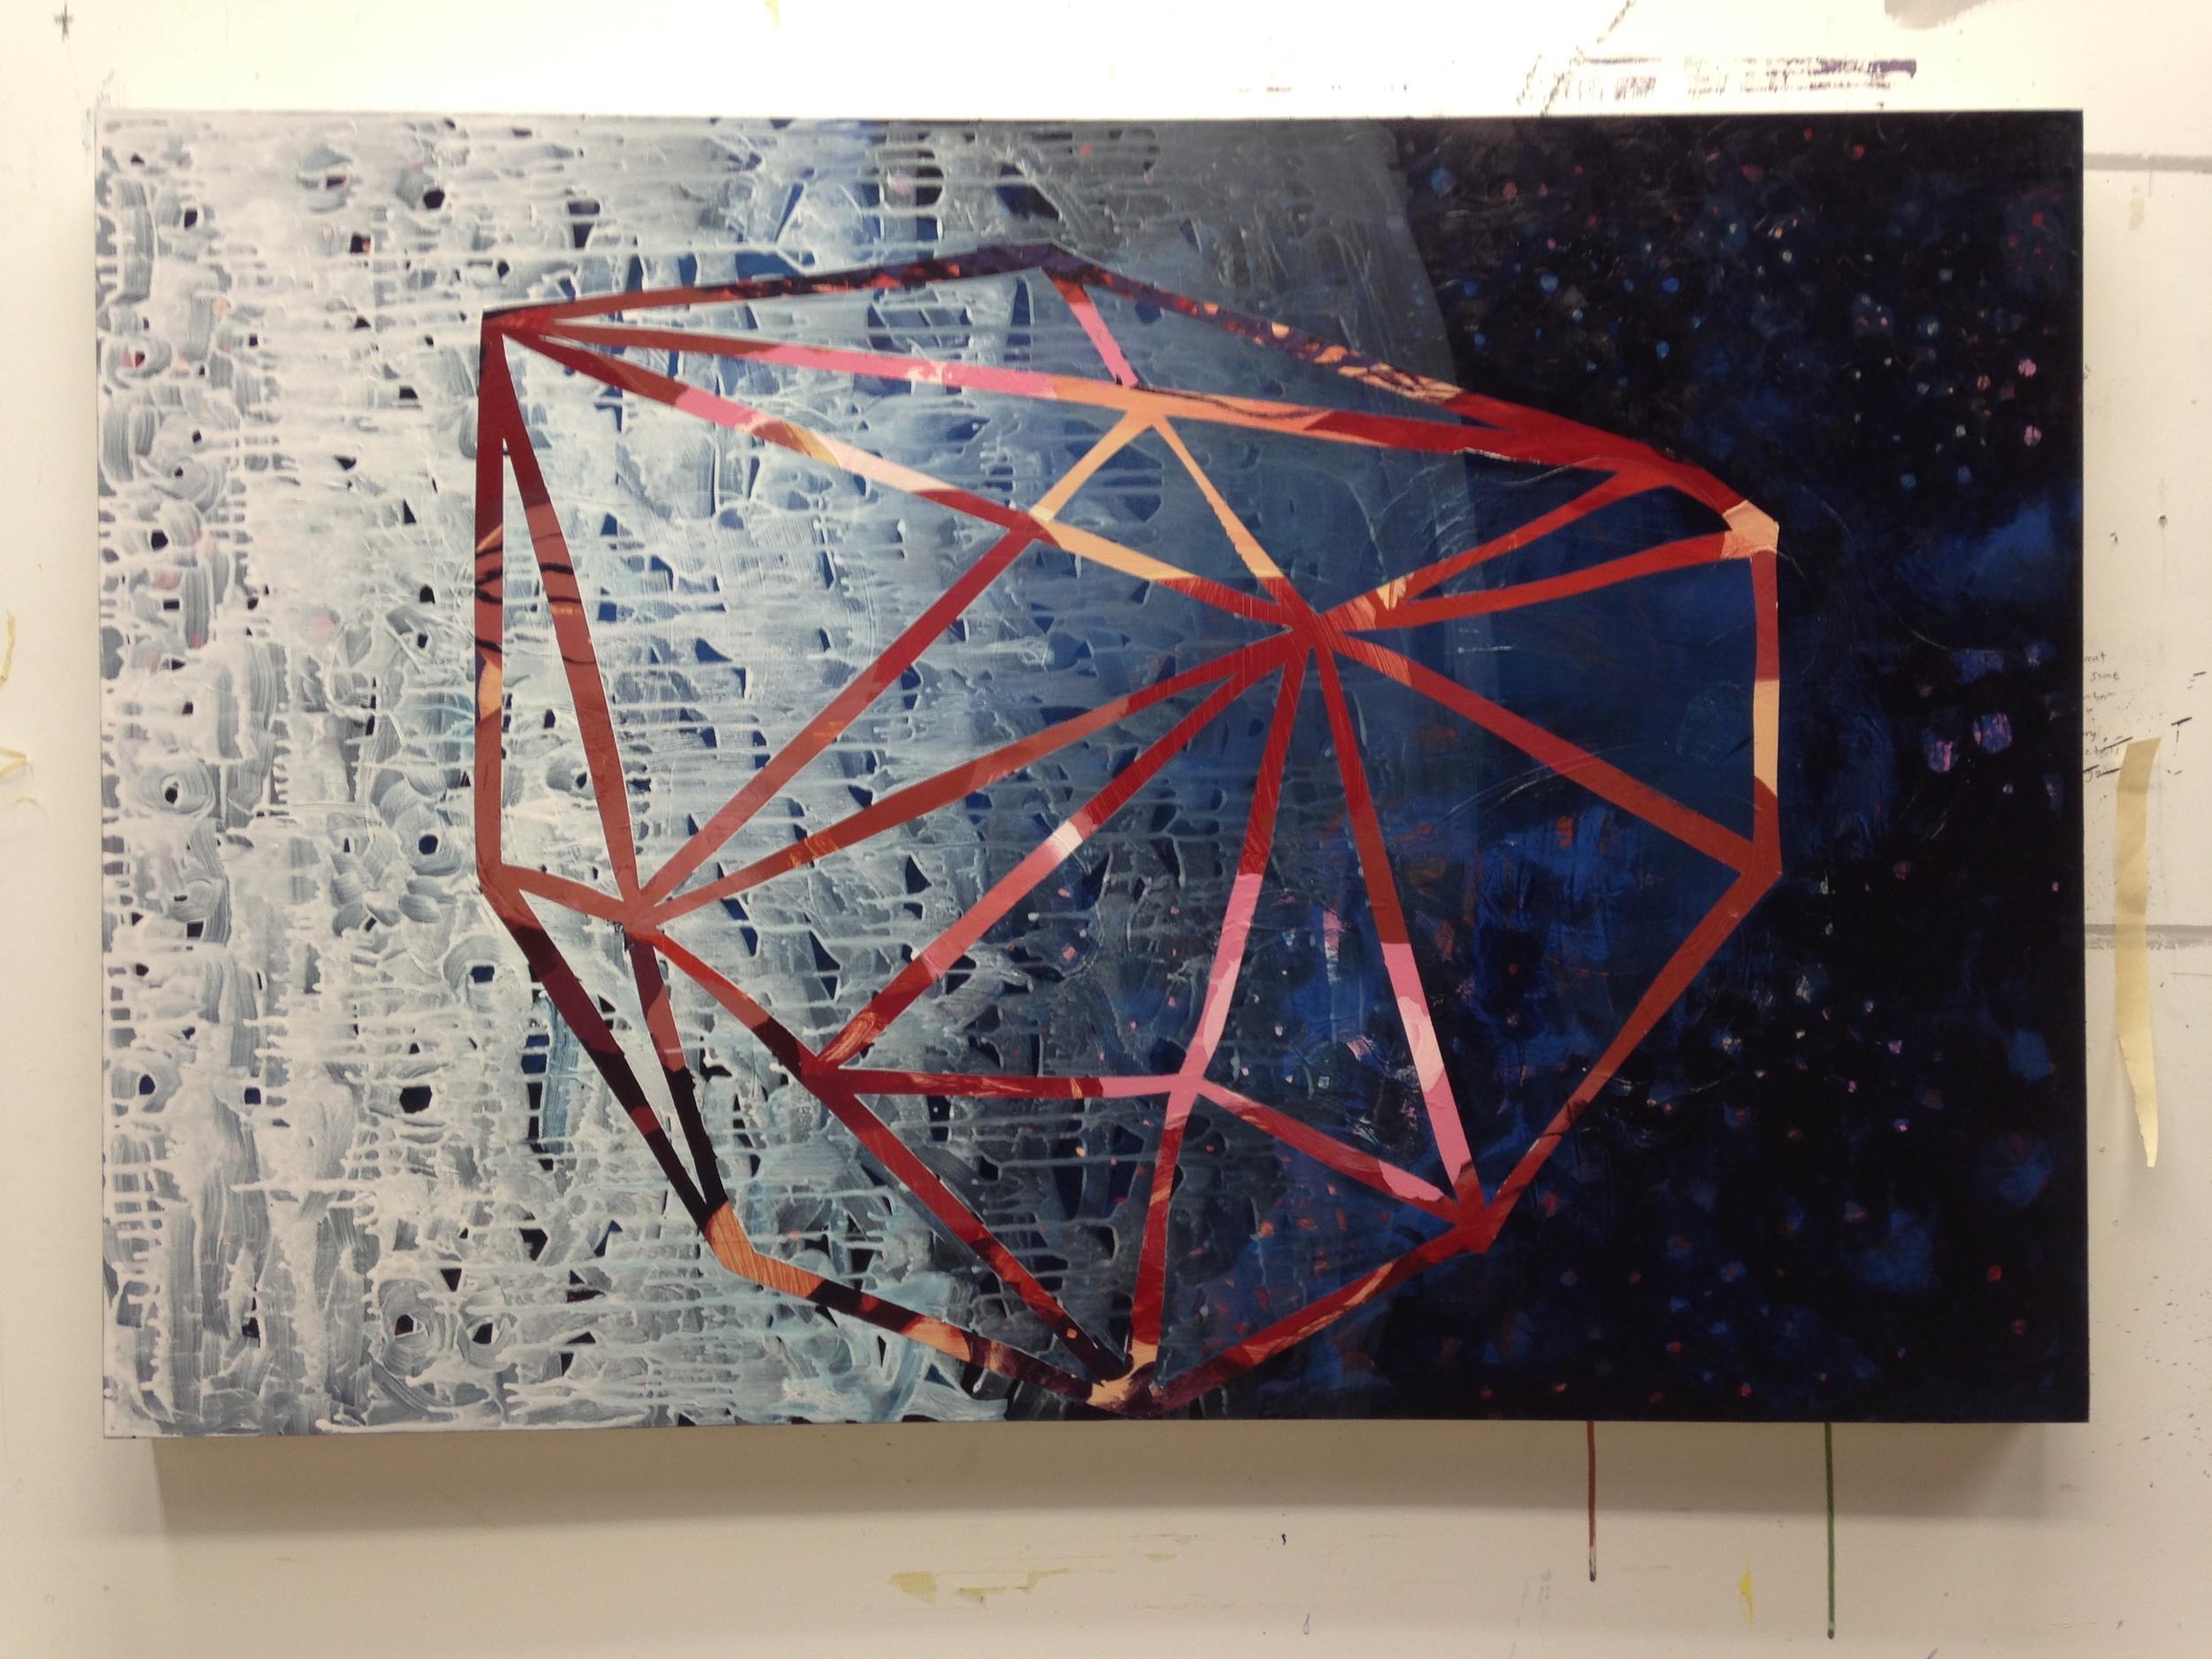 Work in progress, acrylic on birch panel, 42 x 28 inches